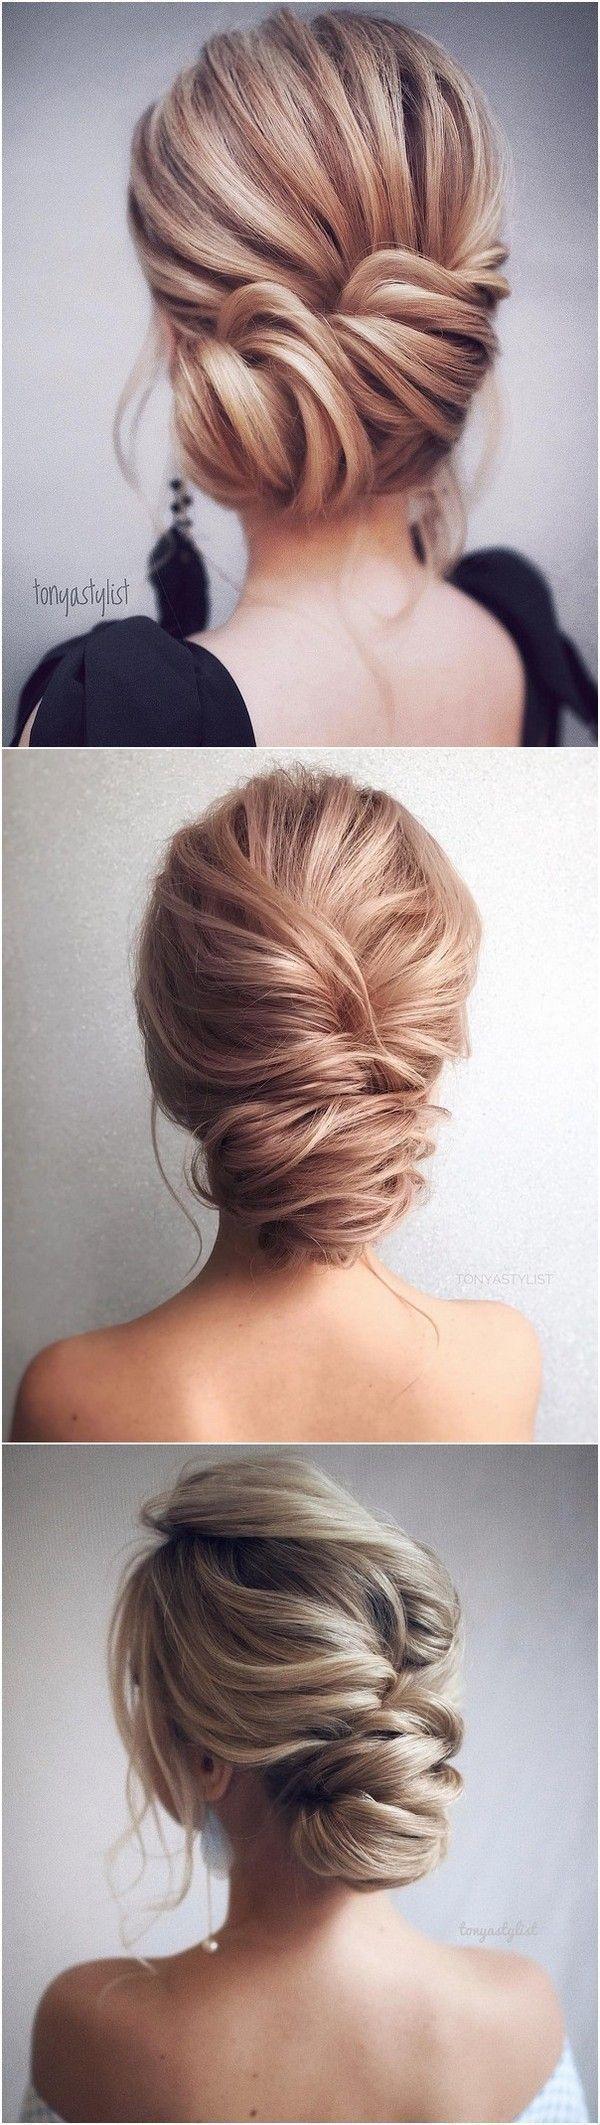 elegant updo wedding hairstyles #wedding #hairstyles #weddinghairstyles #peinadosartisticos